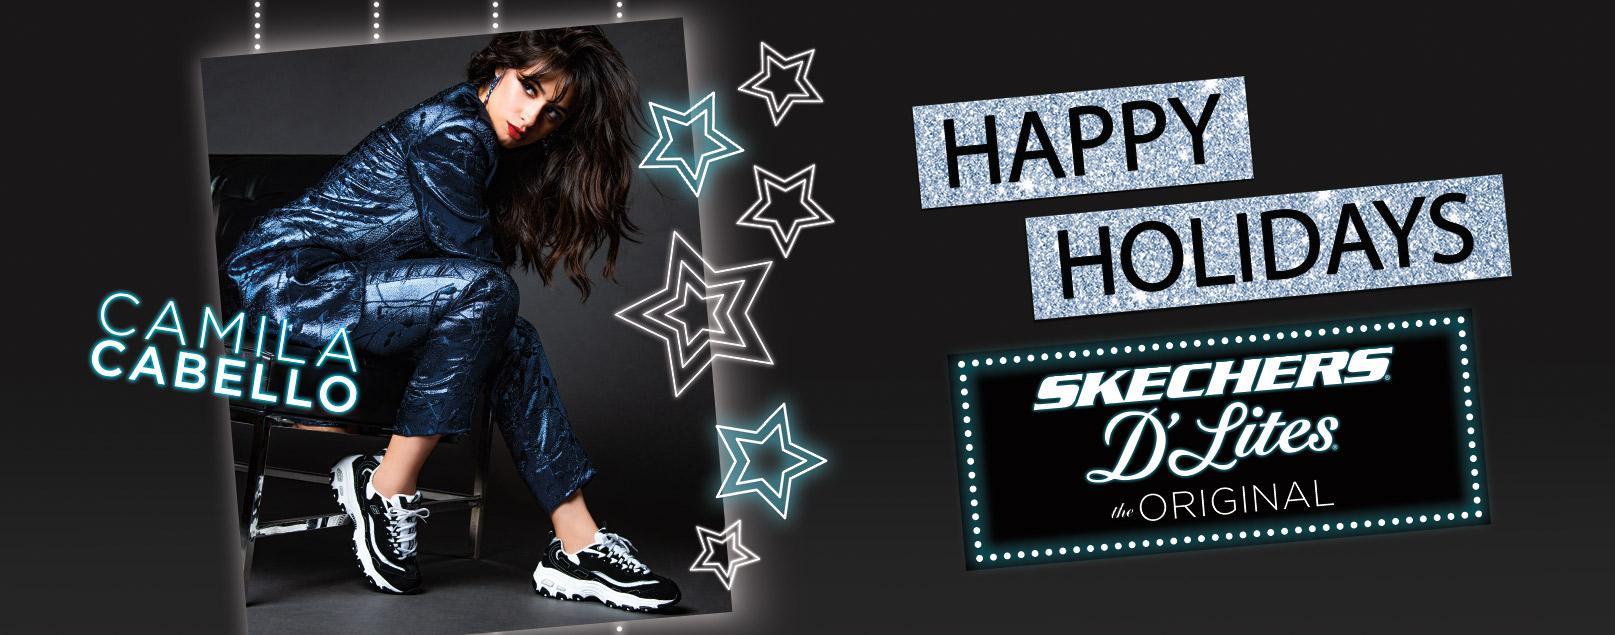 Find Women's Sport athletic shoes on skechers.com